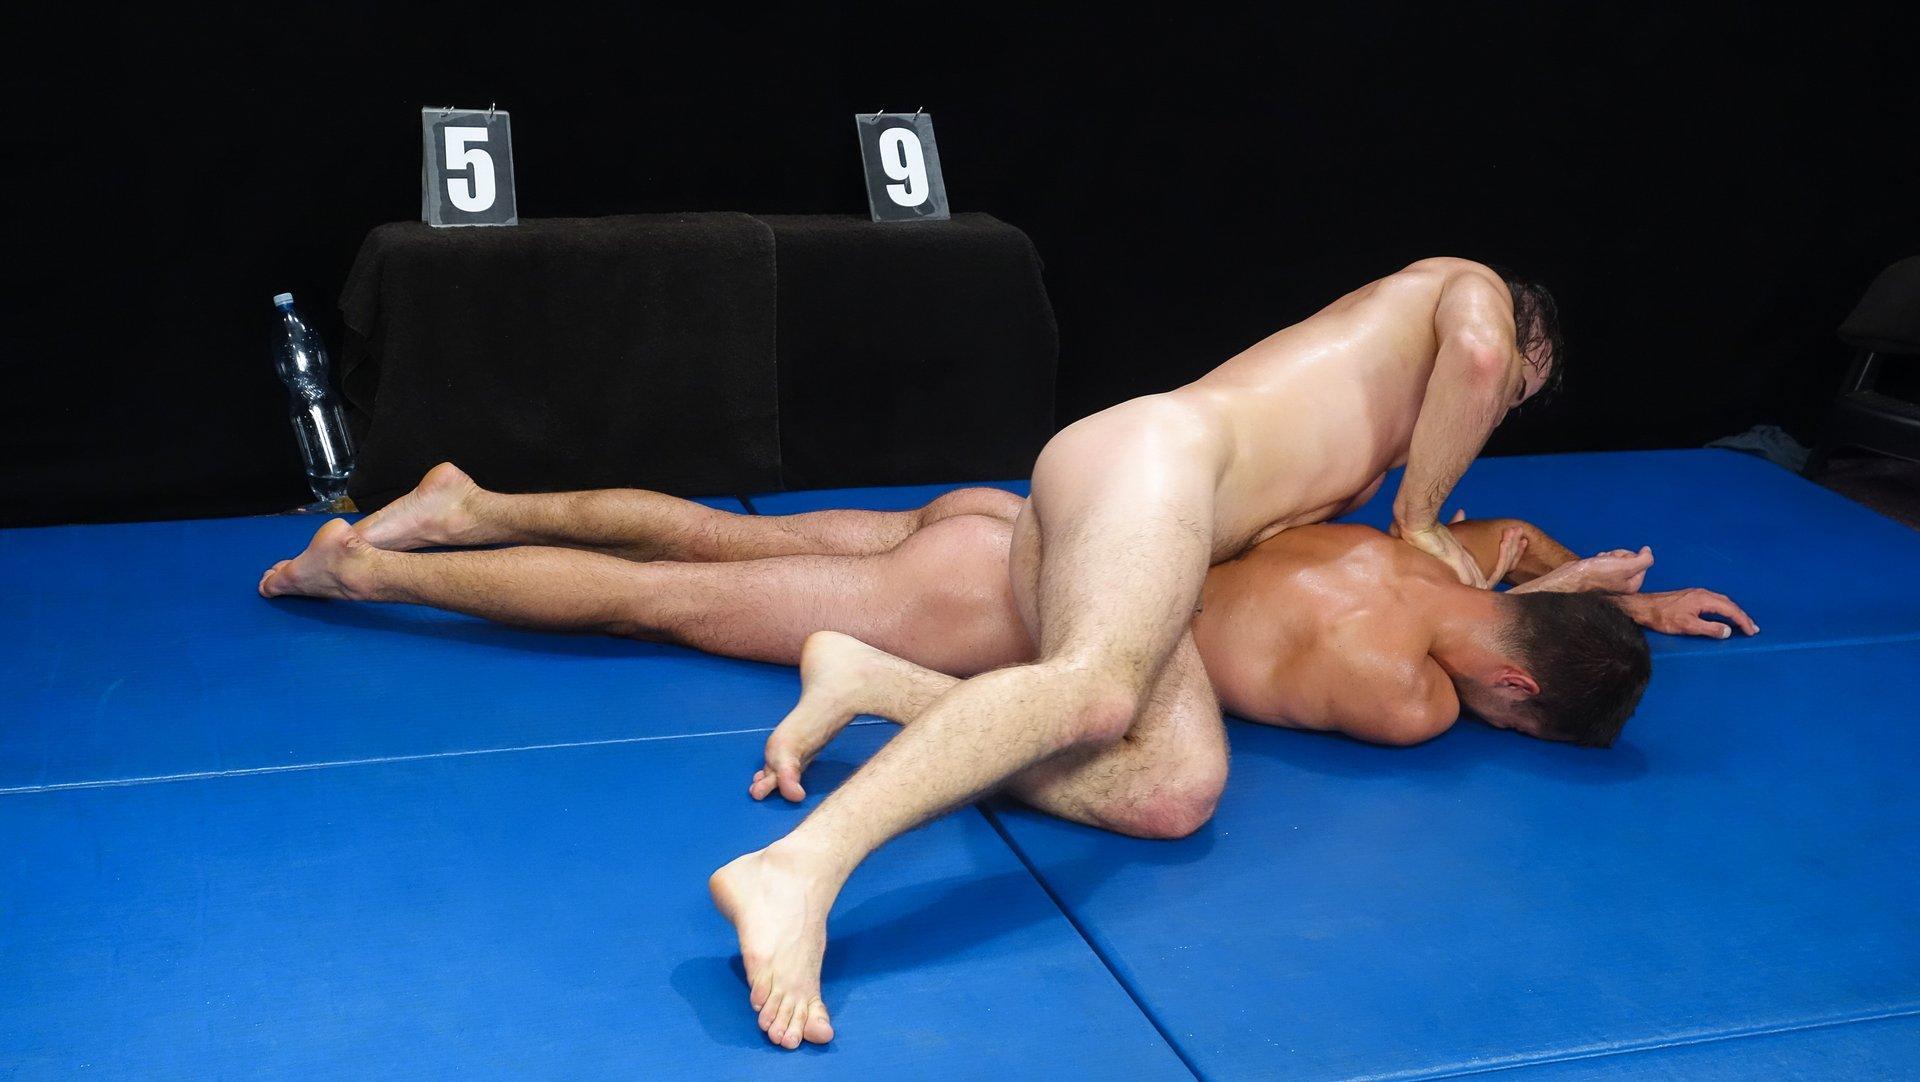 Photo number 7 from Alan vs Viktor - WRESTLING shot for swnude on Kink.com. Featuring Alan Carly and Viktor Burek in hardcore BDSM & Fetish porn.